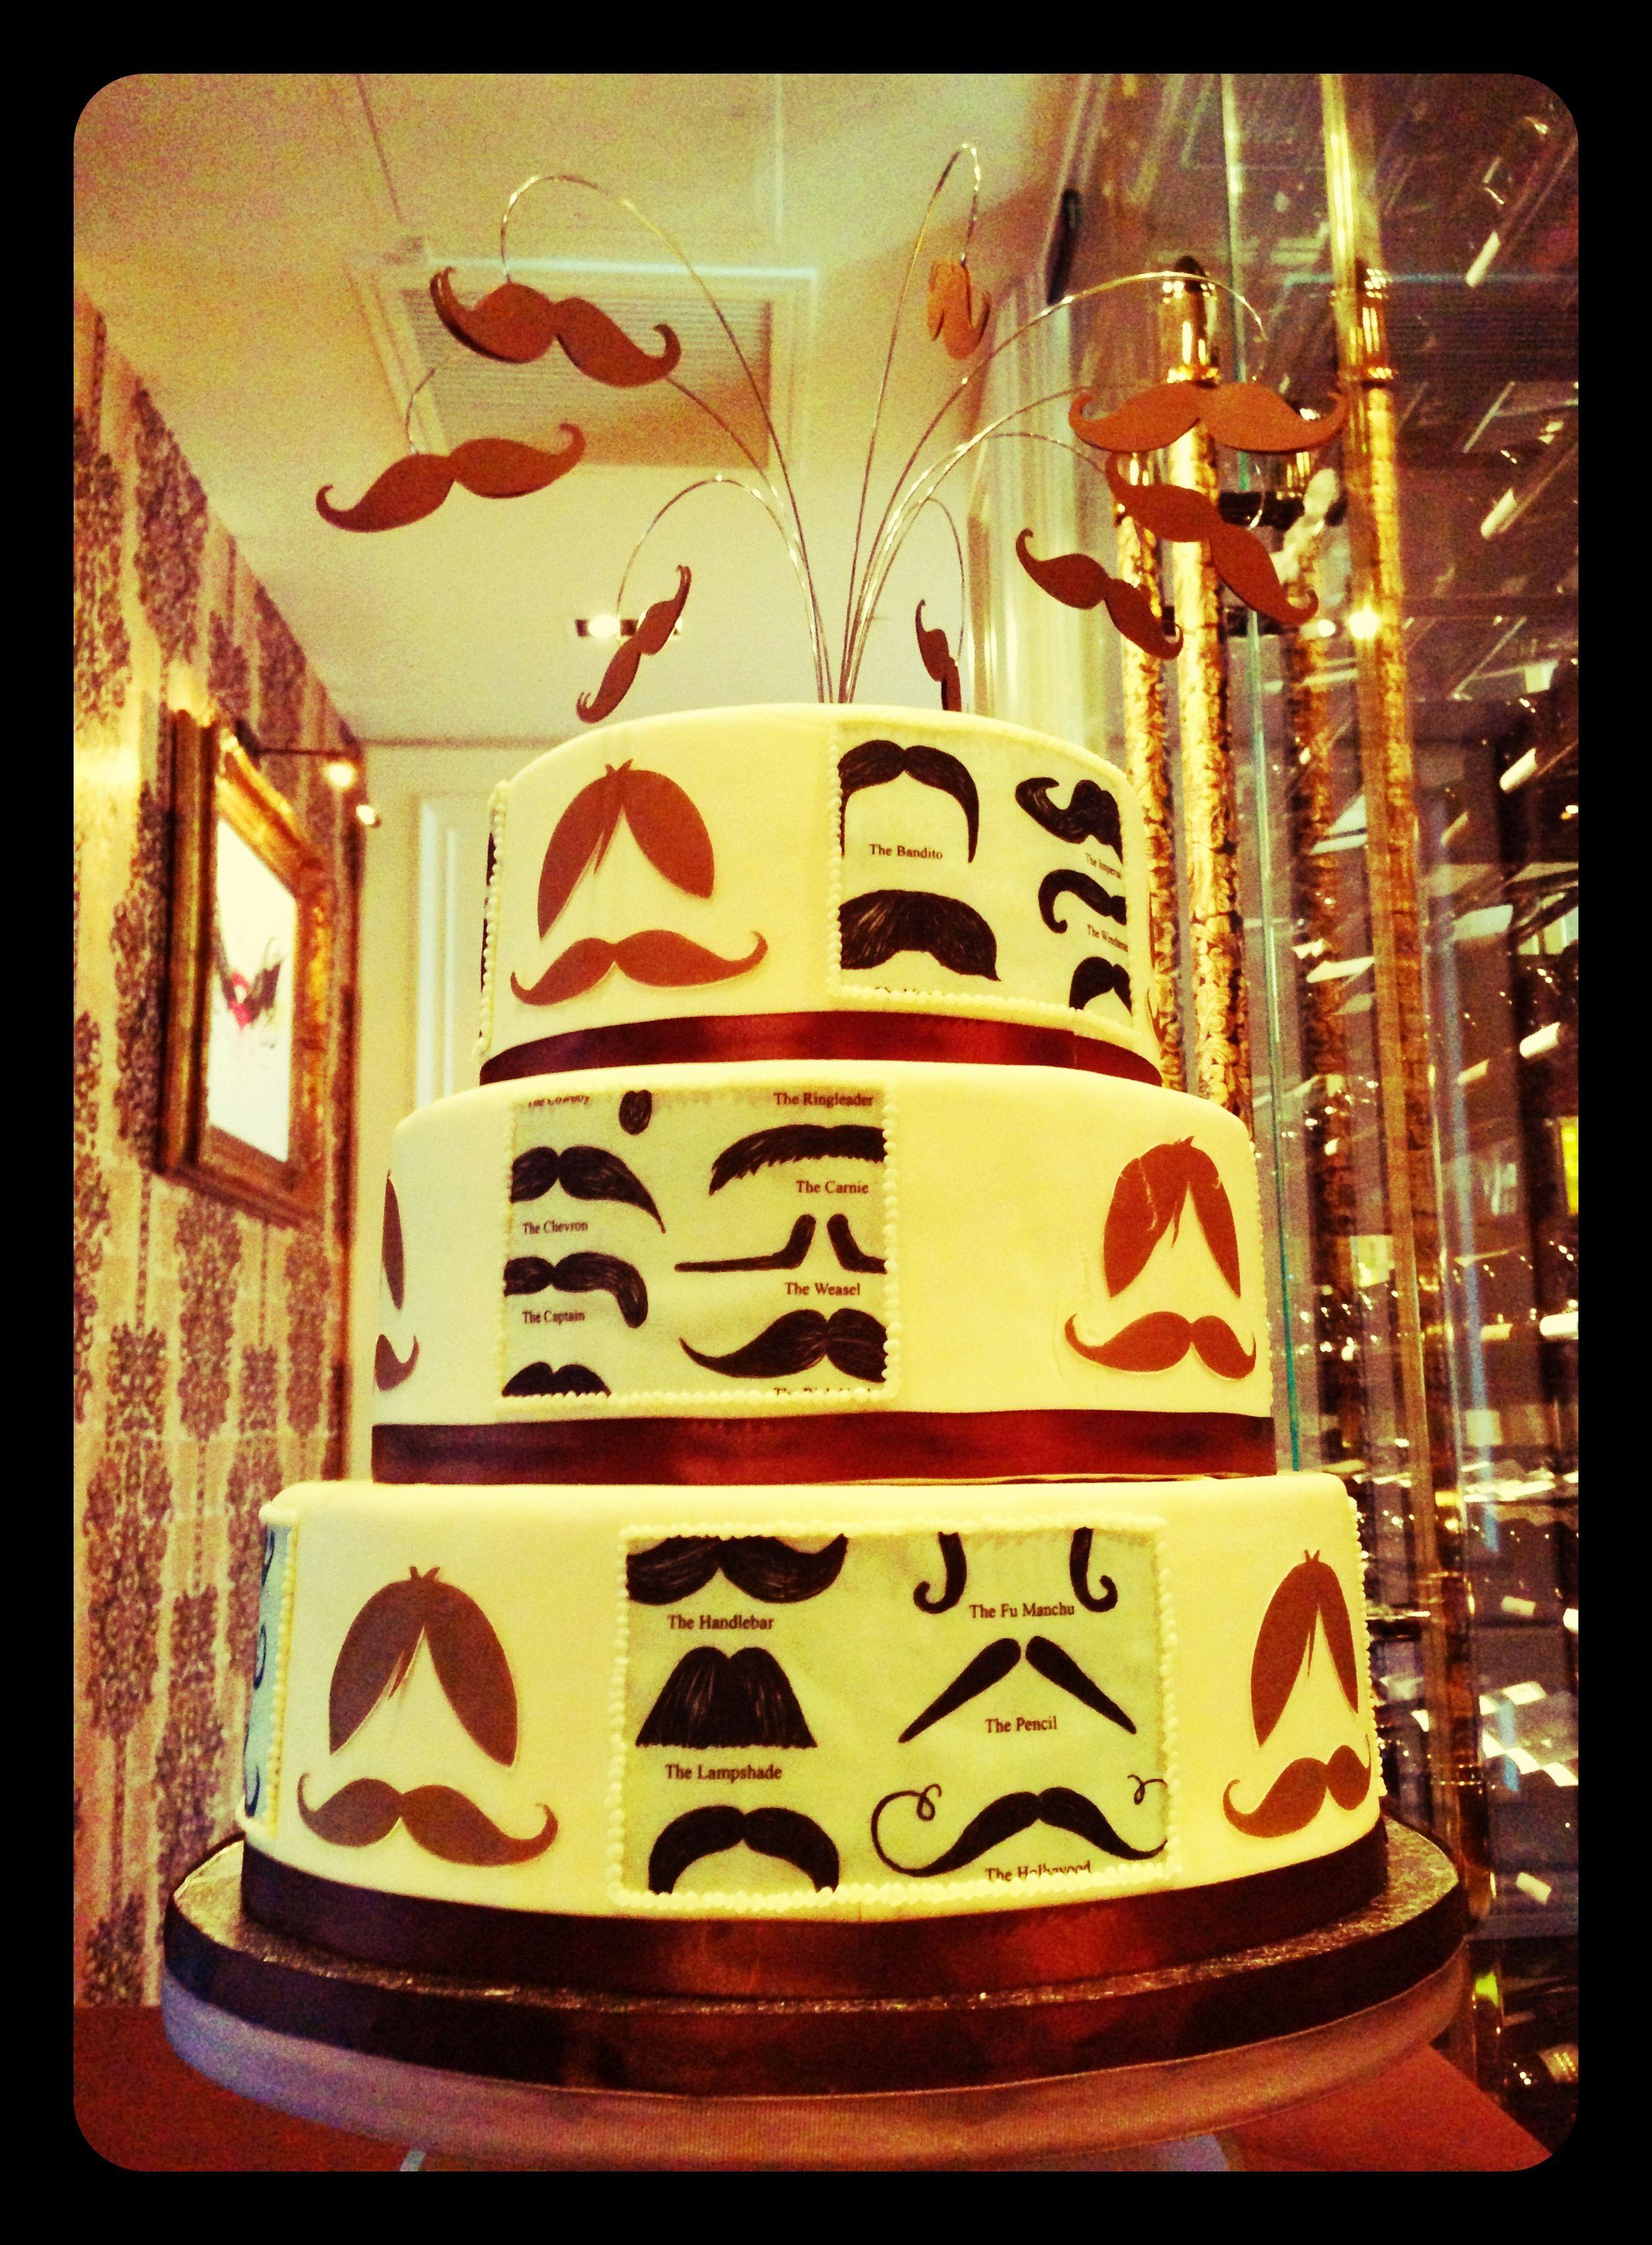 Mustache Bash birthday cake, red velvet, cream cheese mousse (The Barrymore, Las Vegas)